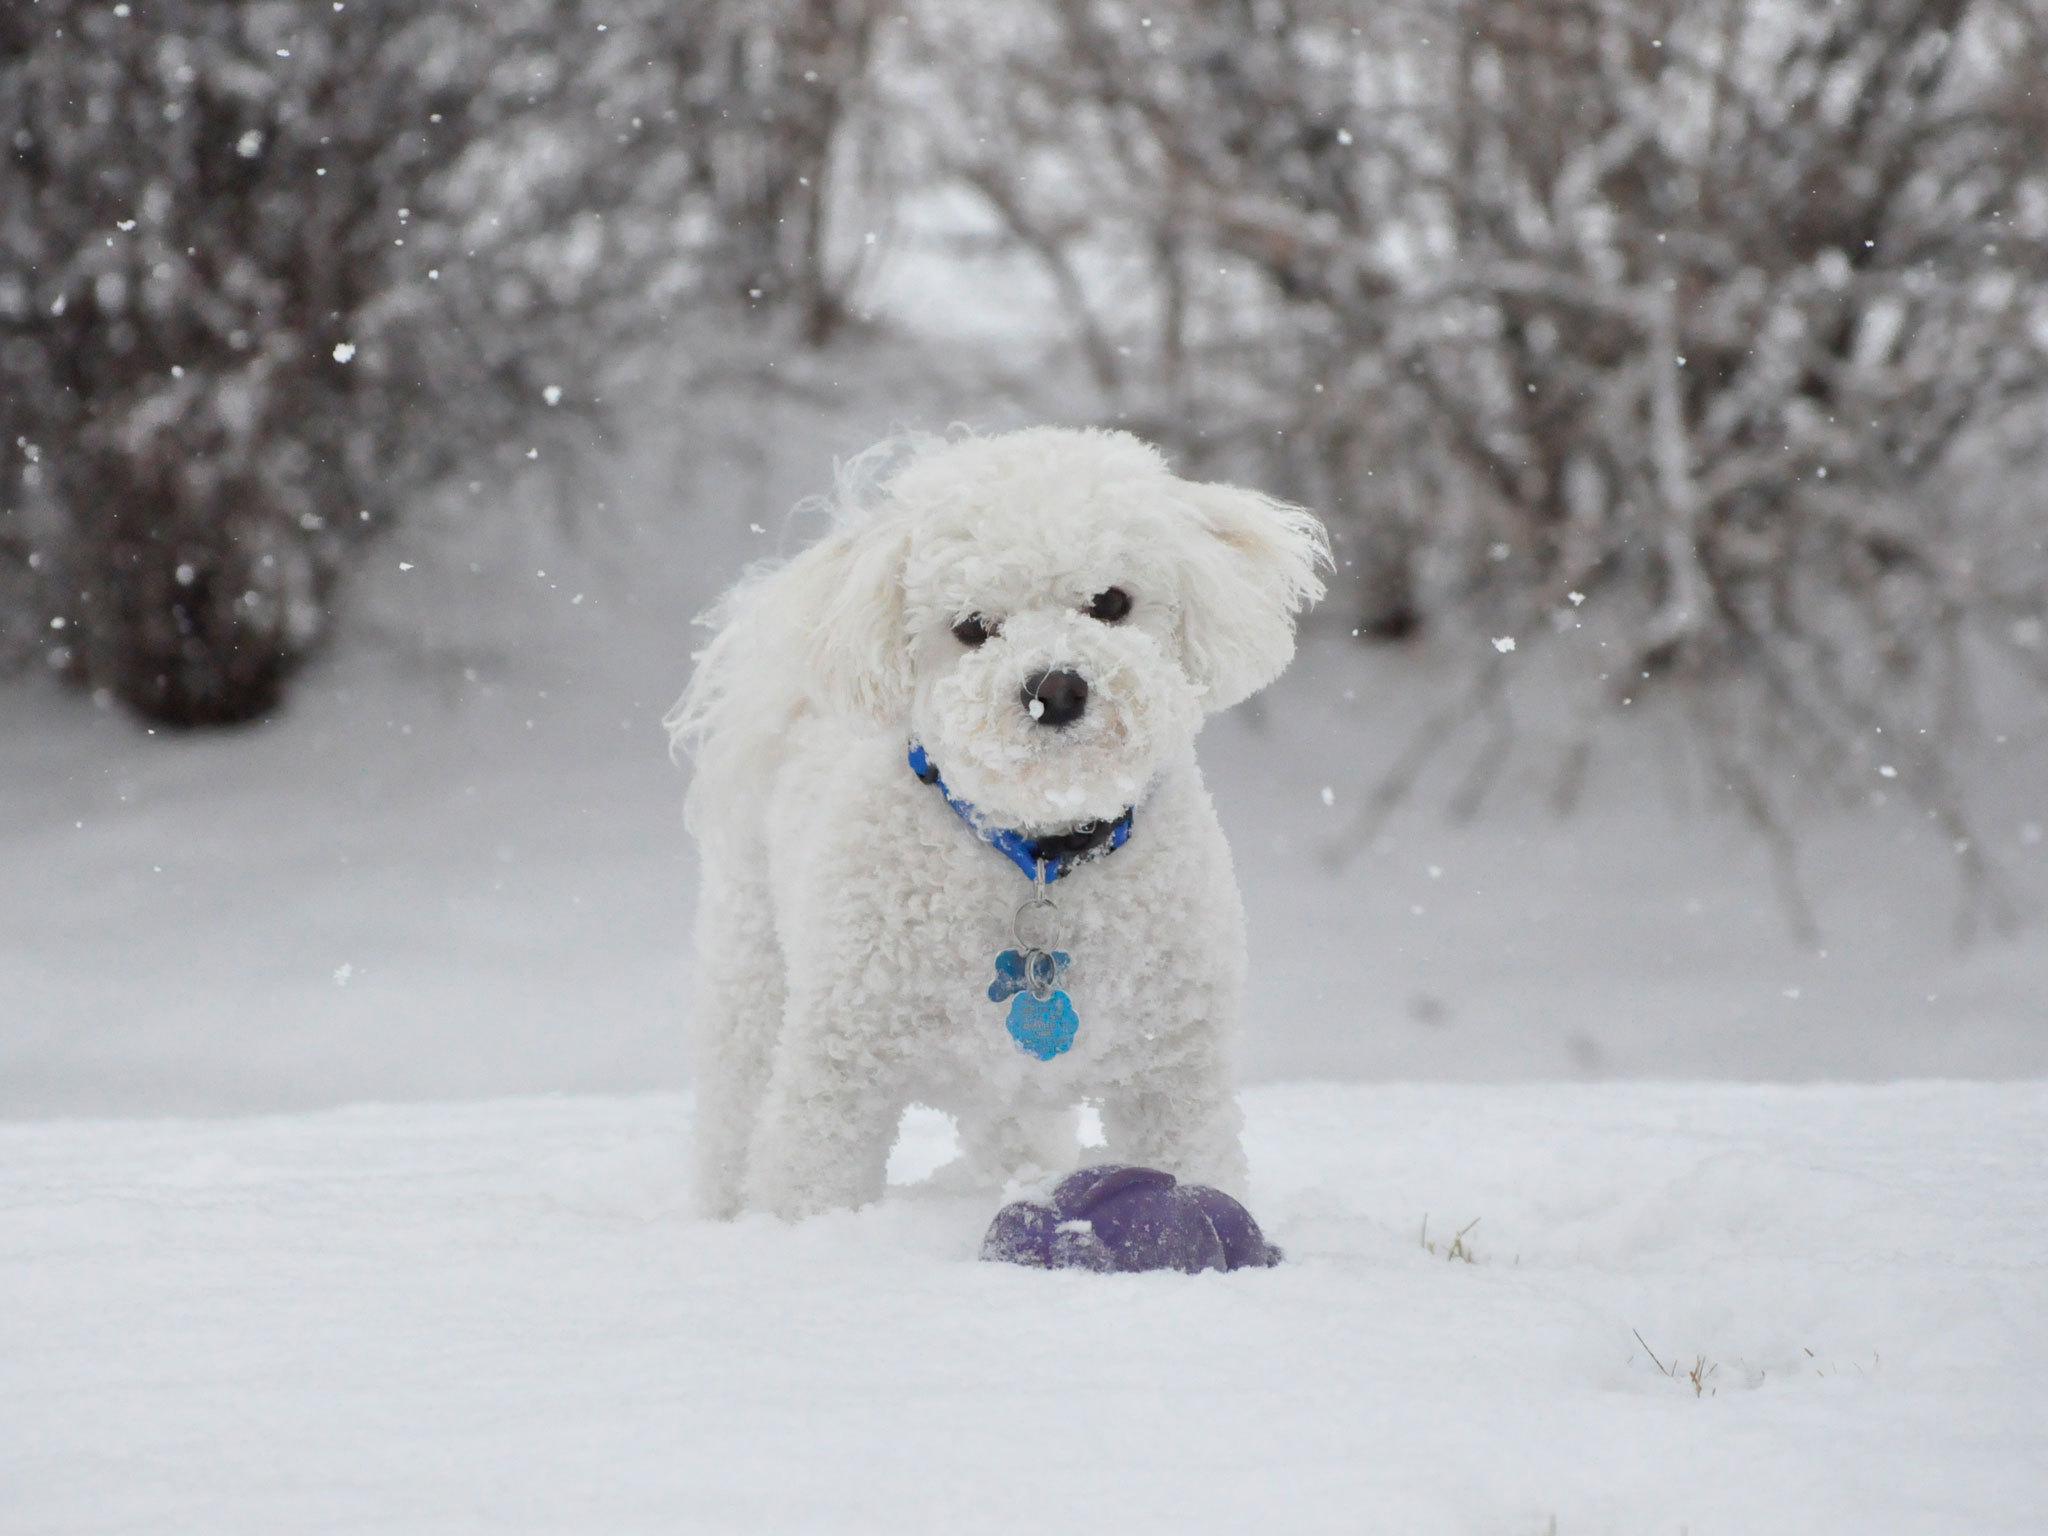 щенок снег puppy snow  № 2001810 бесплатно